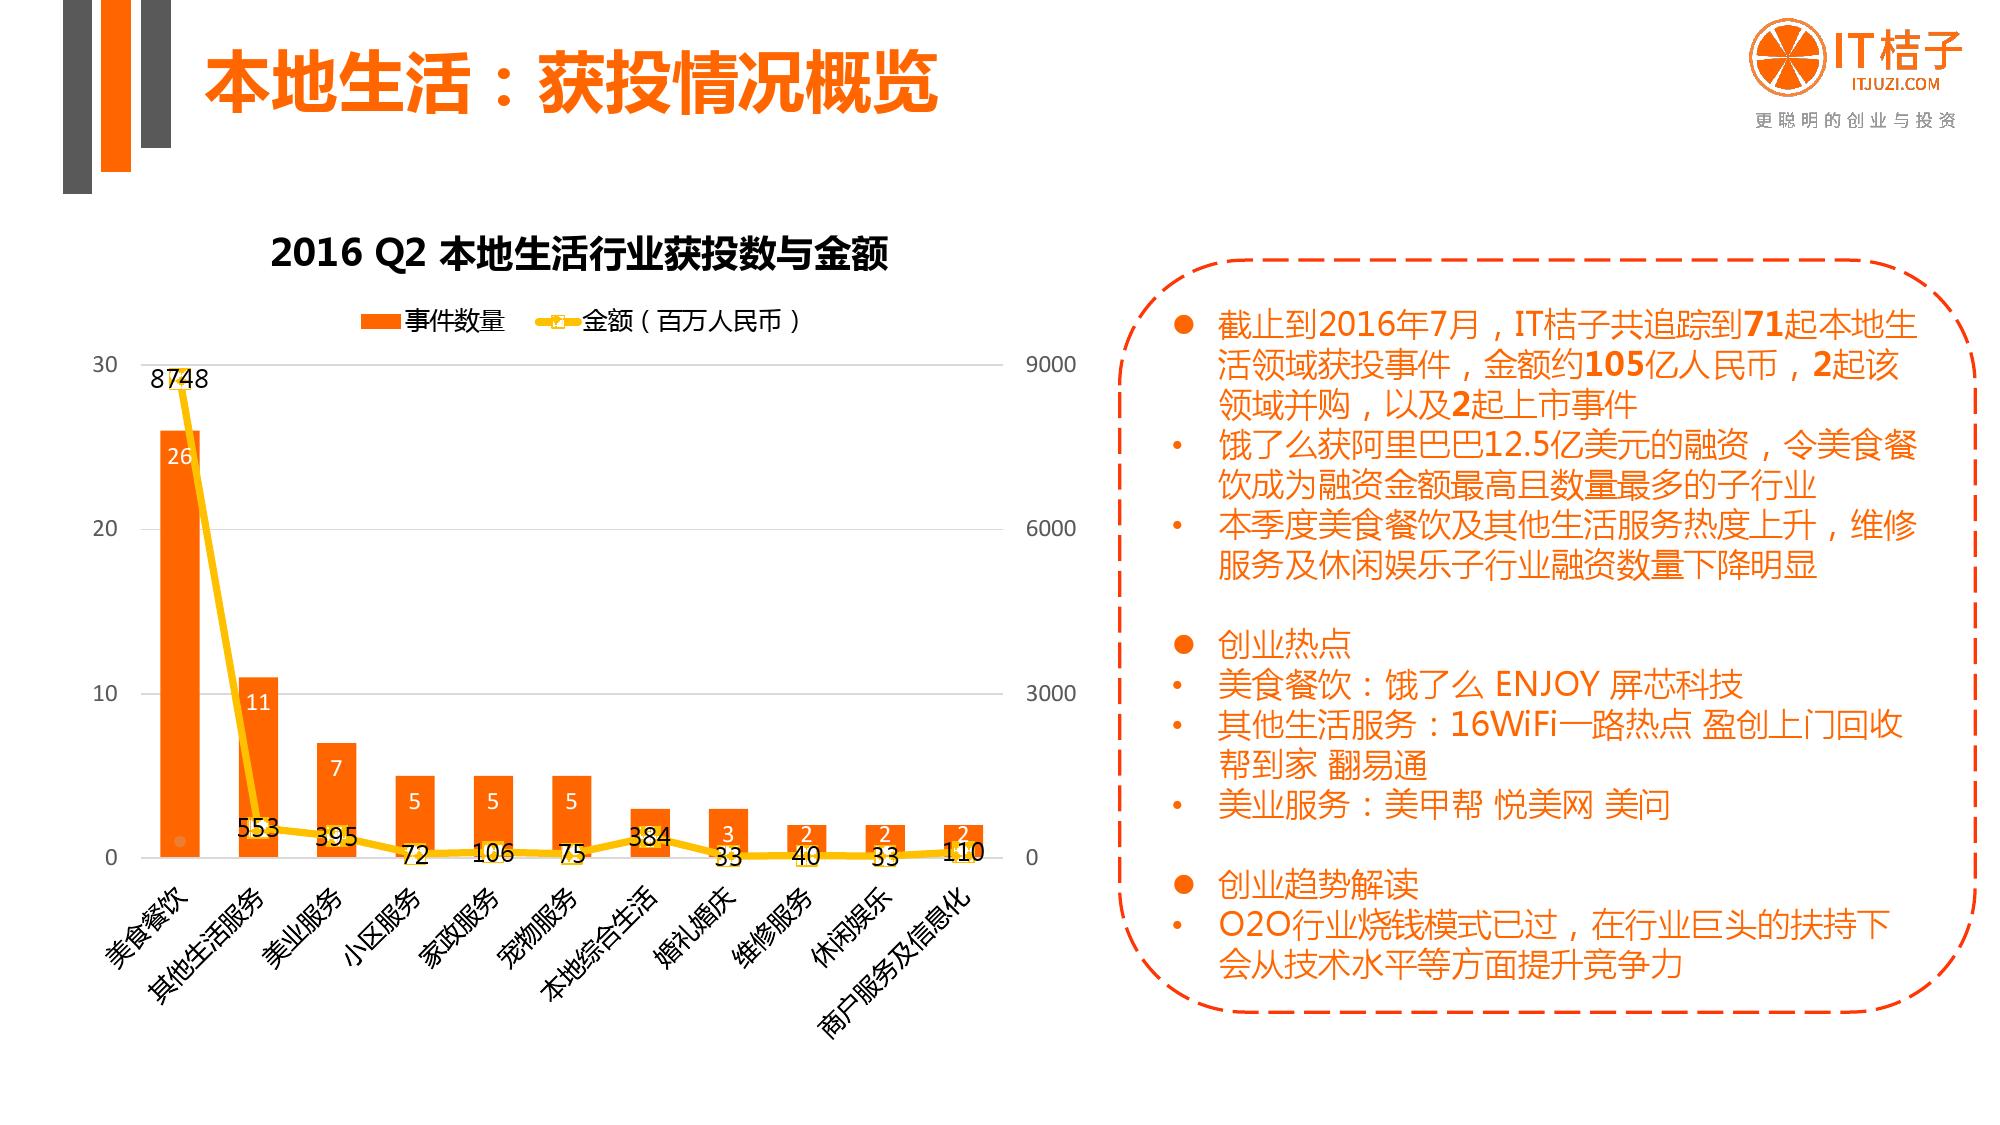 【IT桔子】2016年Q2中国互联网创业投资分析报告_000041